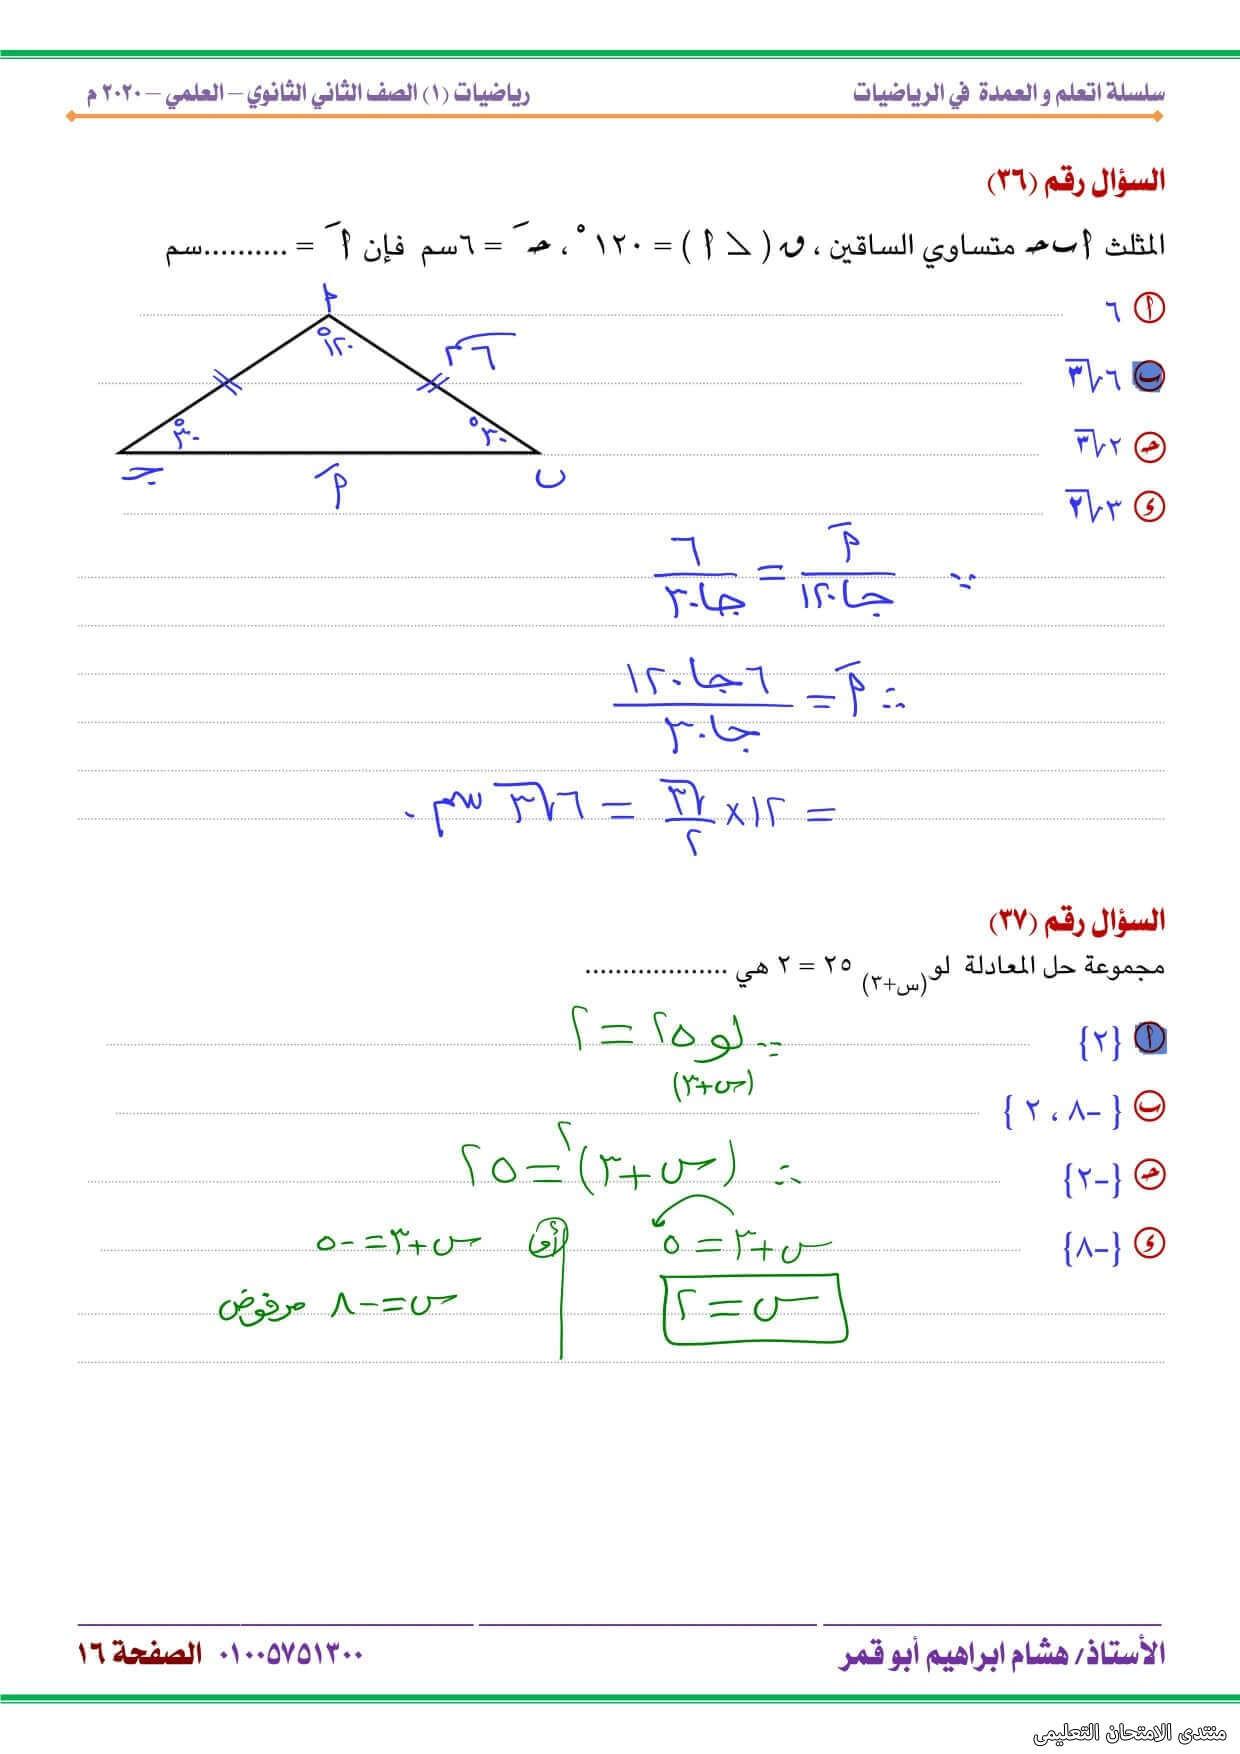 exam-eg.com_1614440950130315.jpg